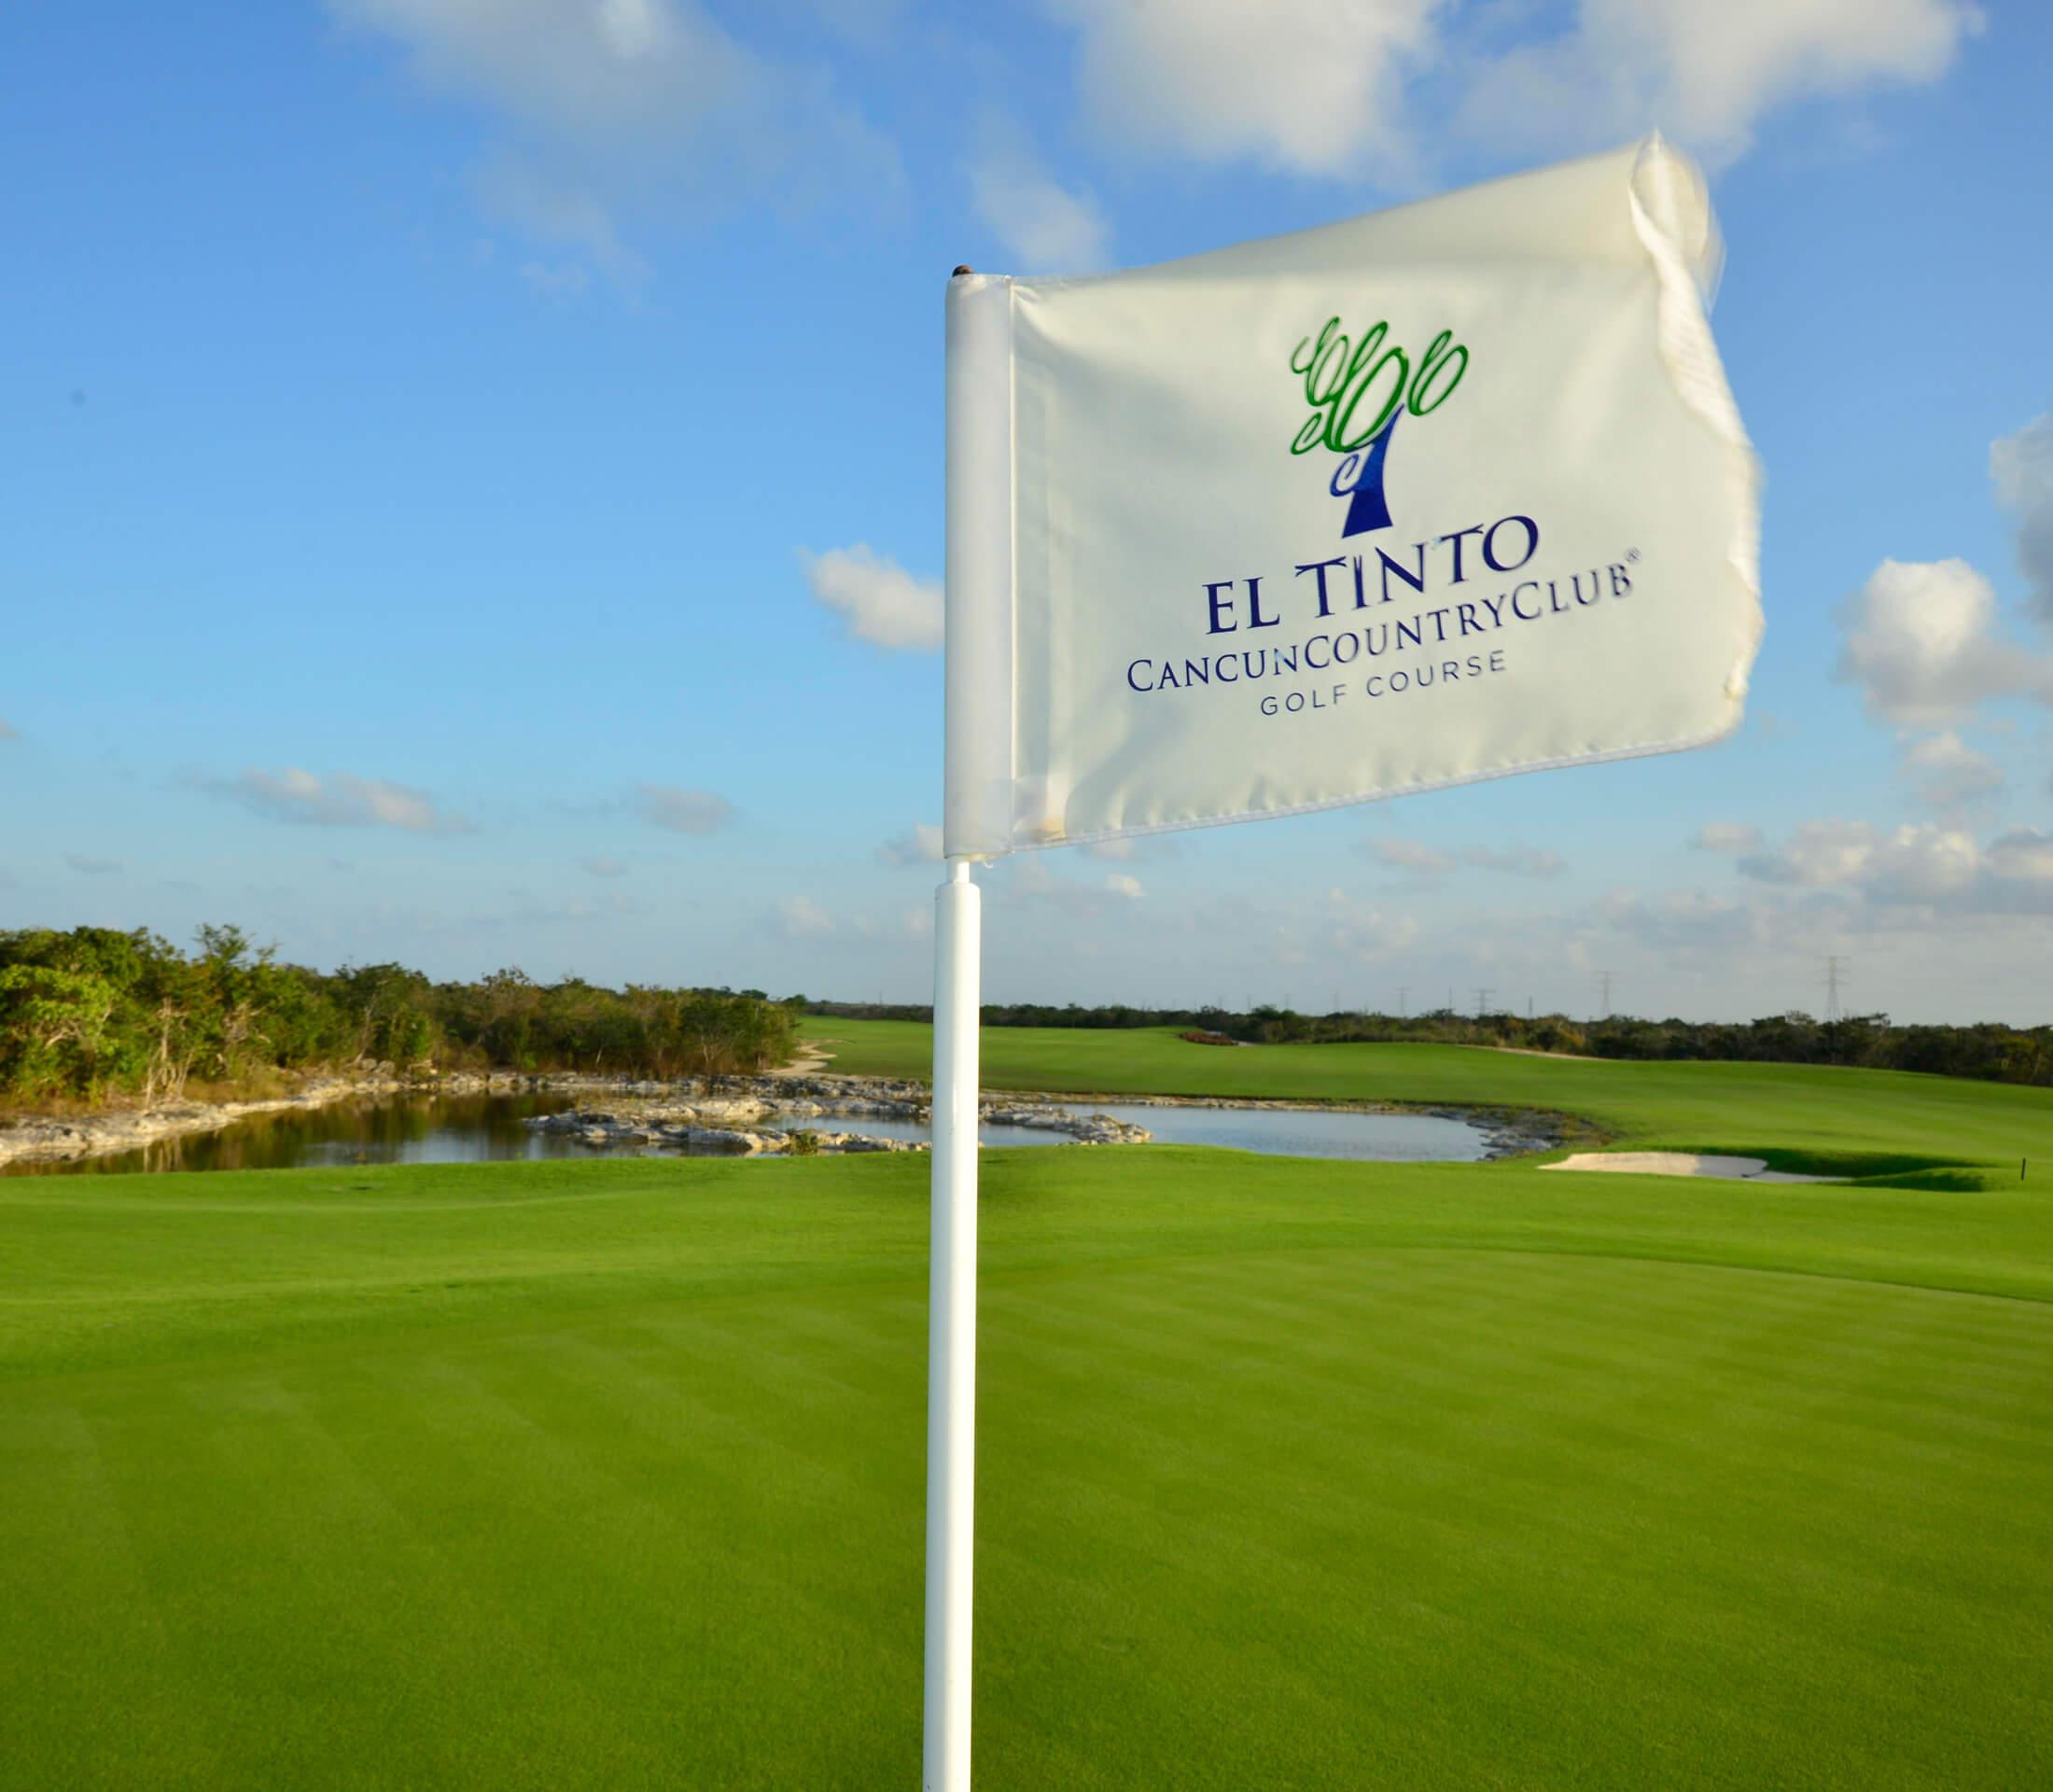 cancun-country-club-golf